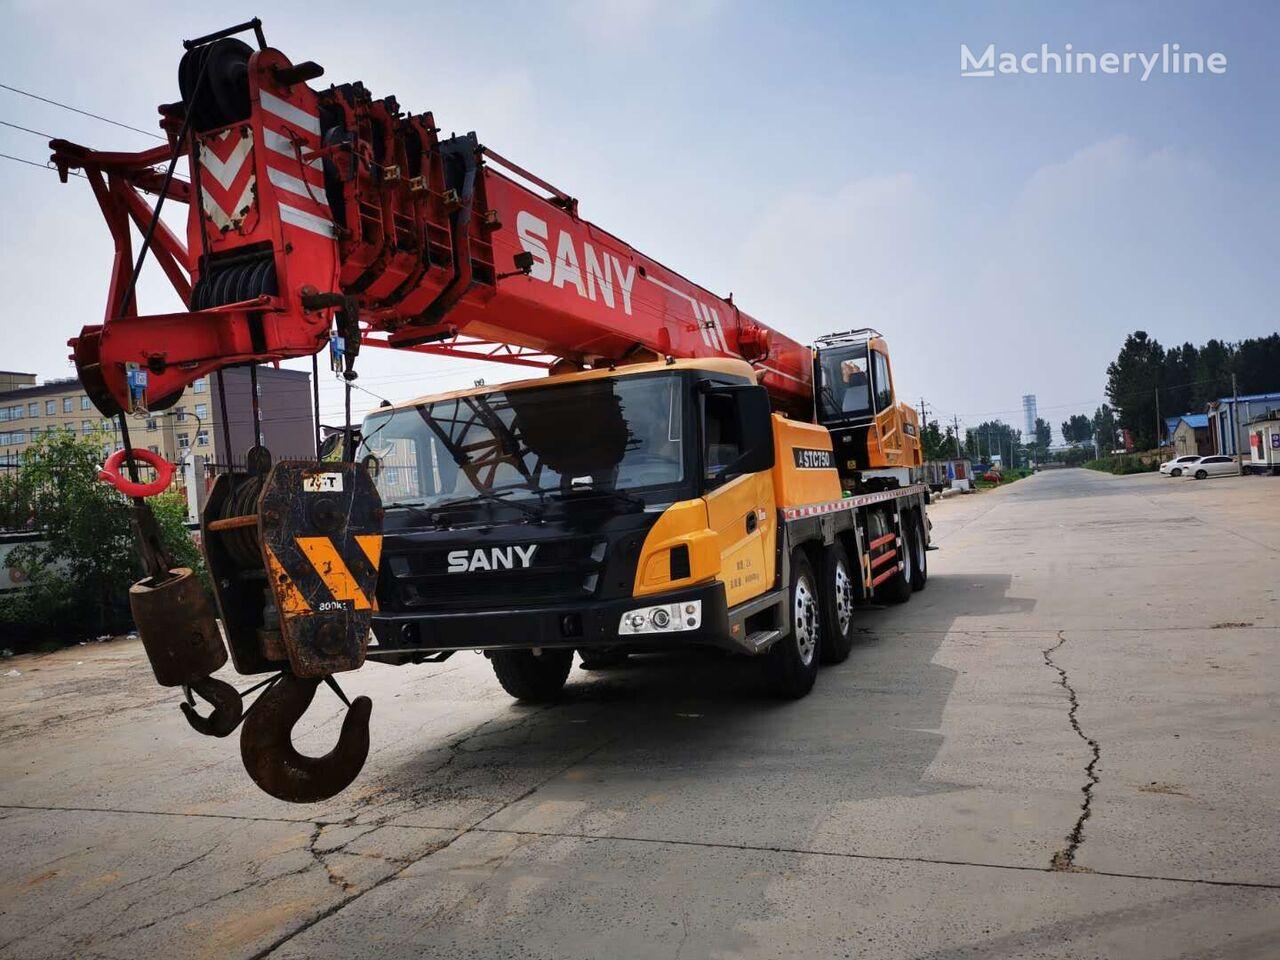 SANY STC750 used crane sany mobile crane